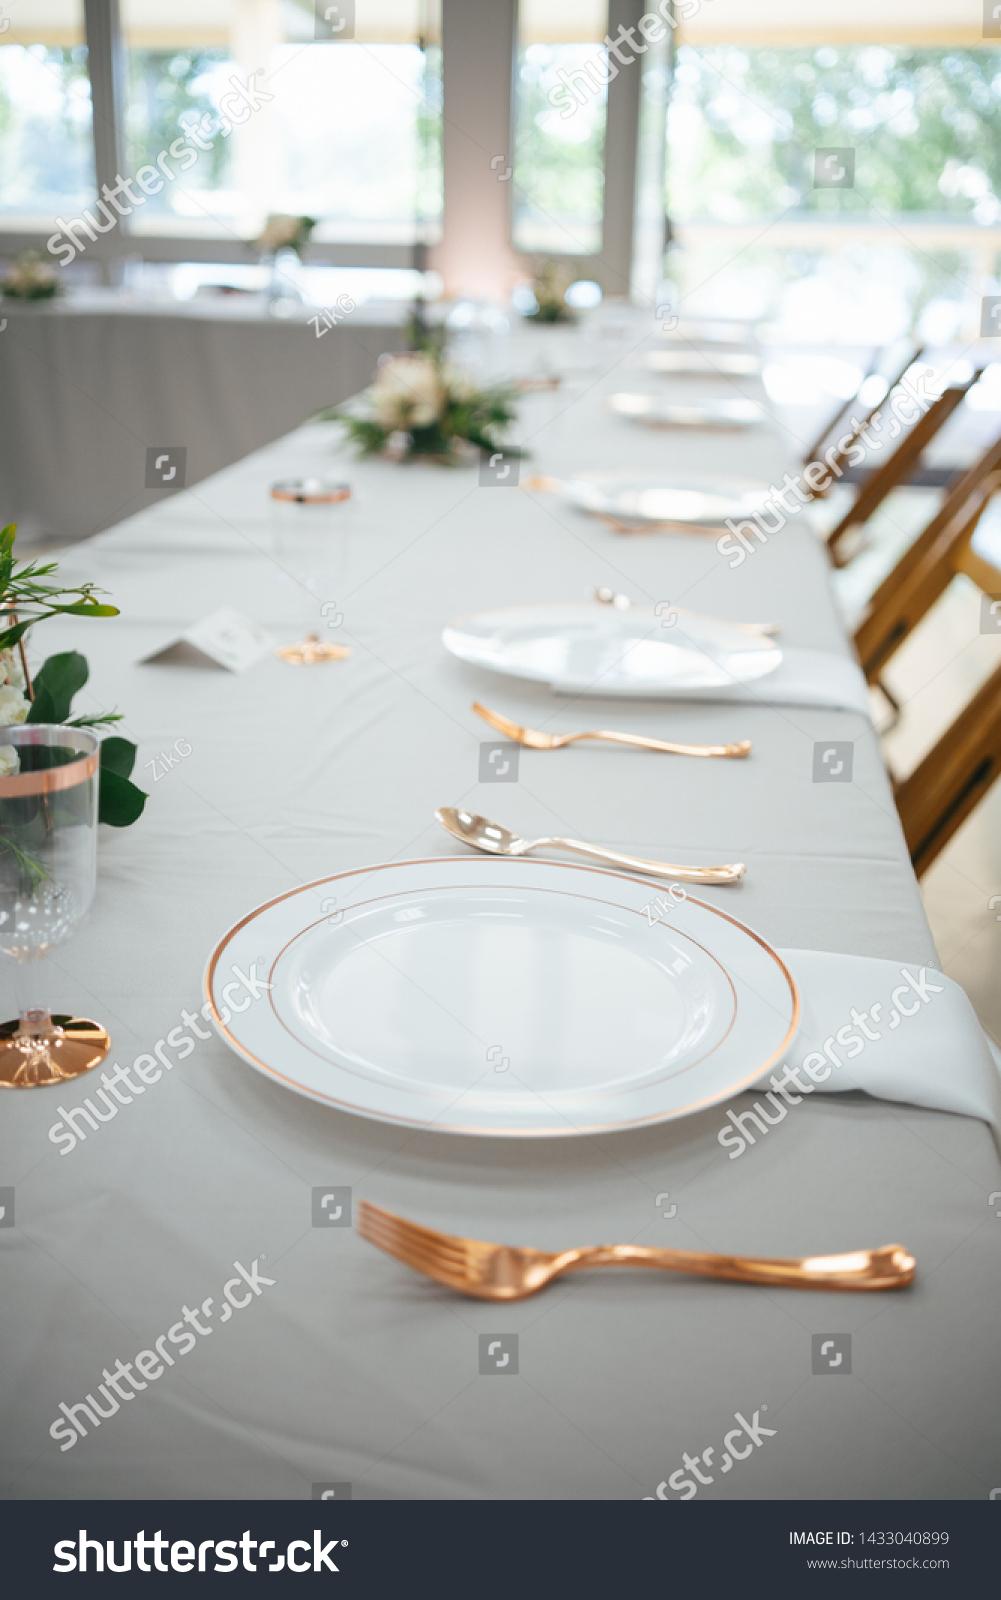 Wedding Bridal Party Table Setup Closeup Stock Photo Edit Now 1433040899